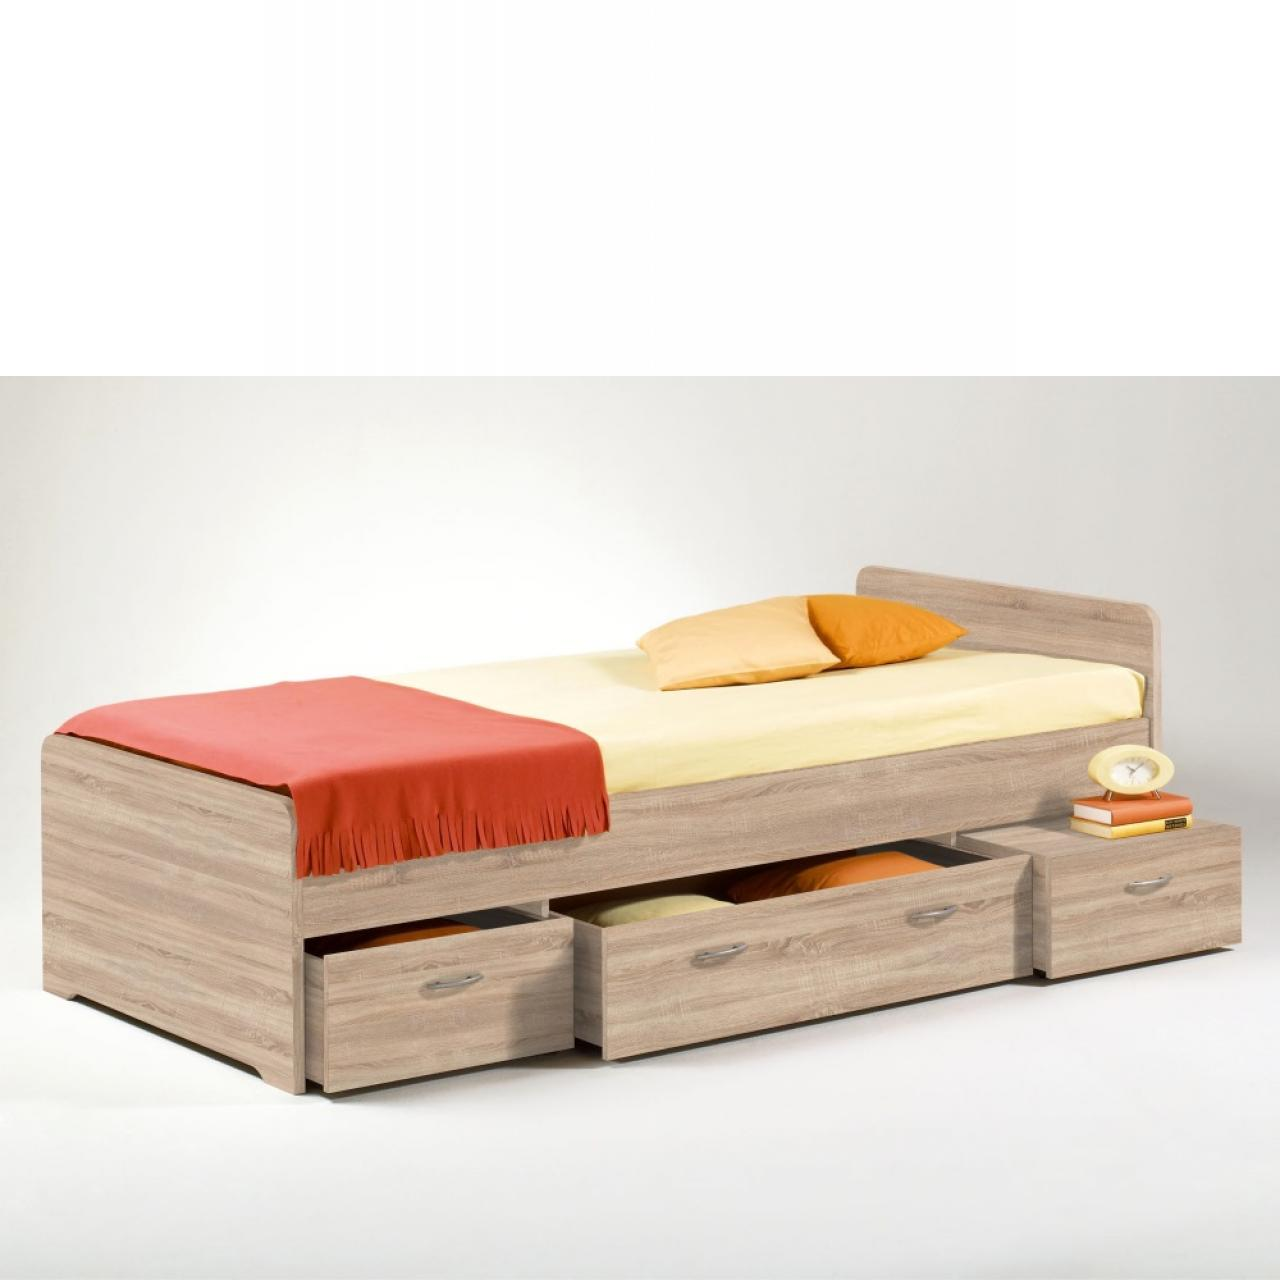 kojenbett 90x200 simple image with kojenbett 90x200 finest best einrichtung images on. Black Bedroom Furniture Sets. Home Design Ideas